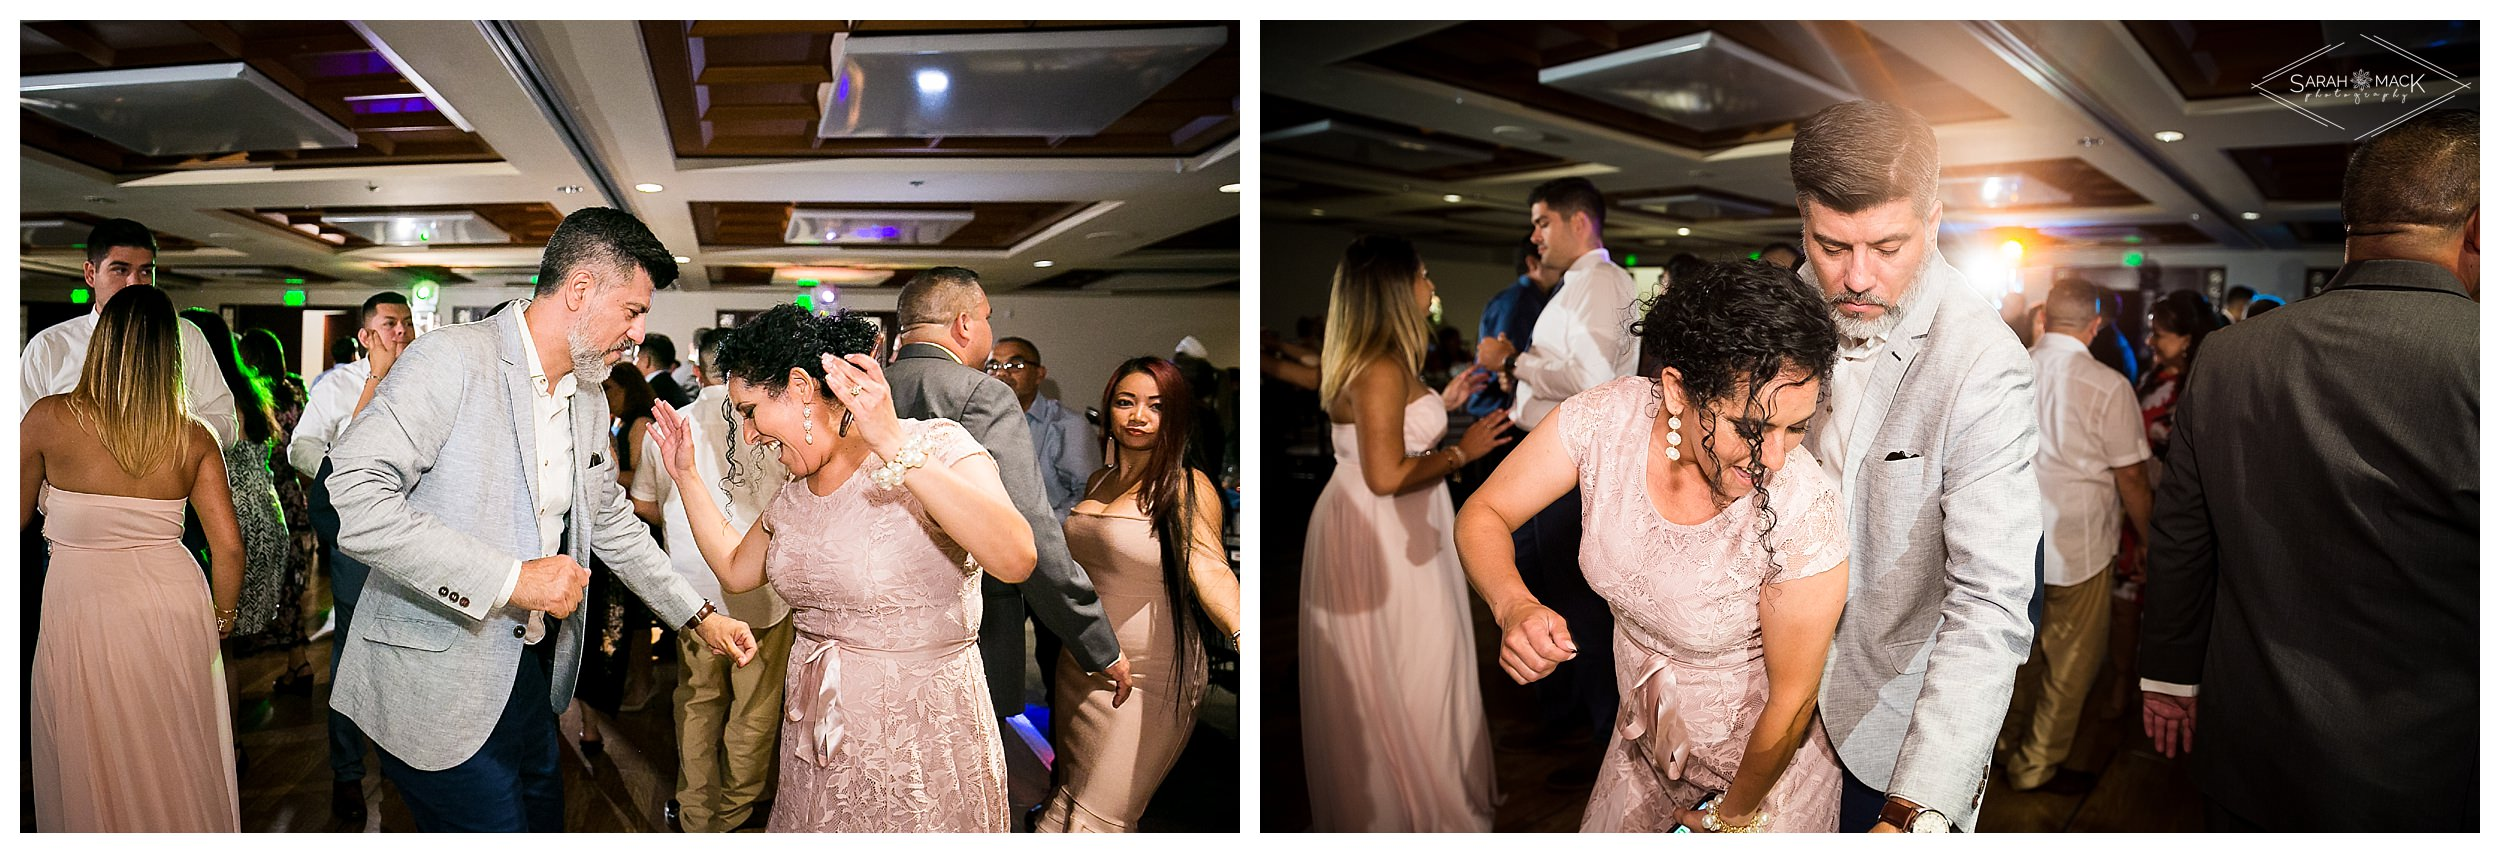 IA-Alta-Vista-Country-Club-Yorba-Linda-Wedding-Photography 641.jpg